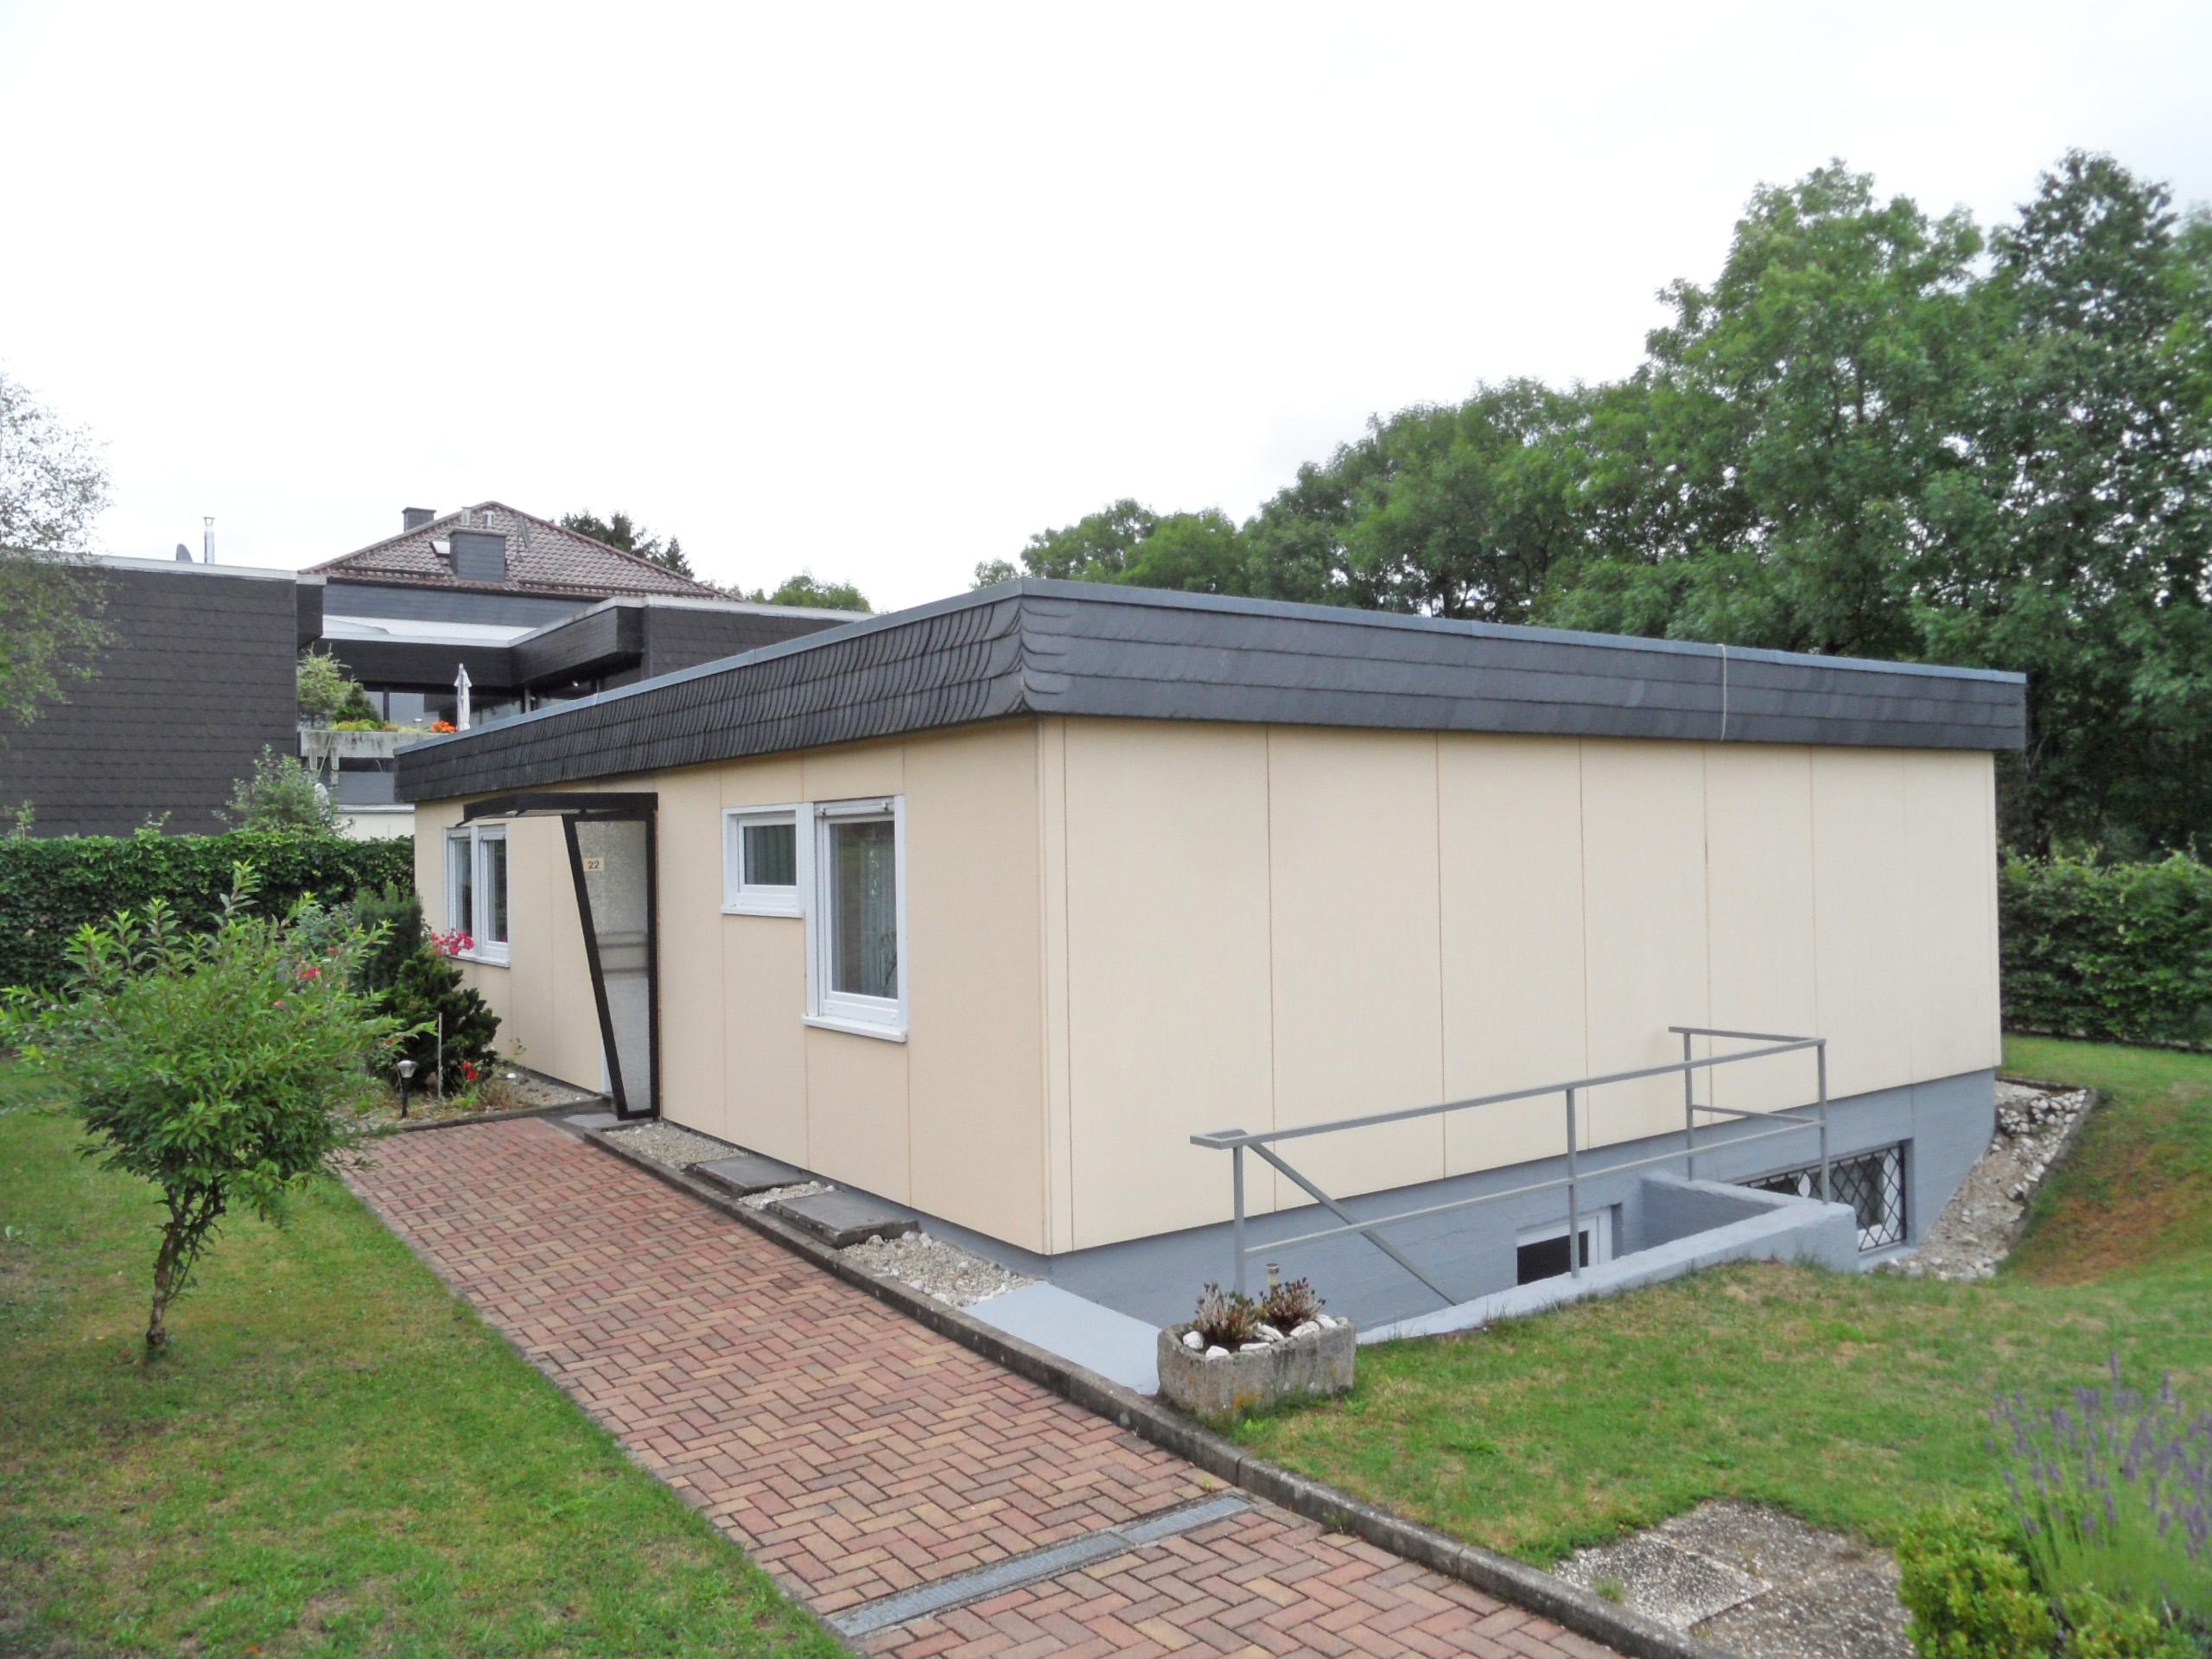 referenzen immobilien volksbank eifel eg. Black Bedroom Furniture Sets. Home Design Ideas